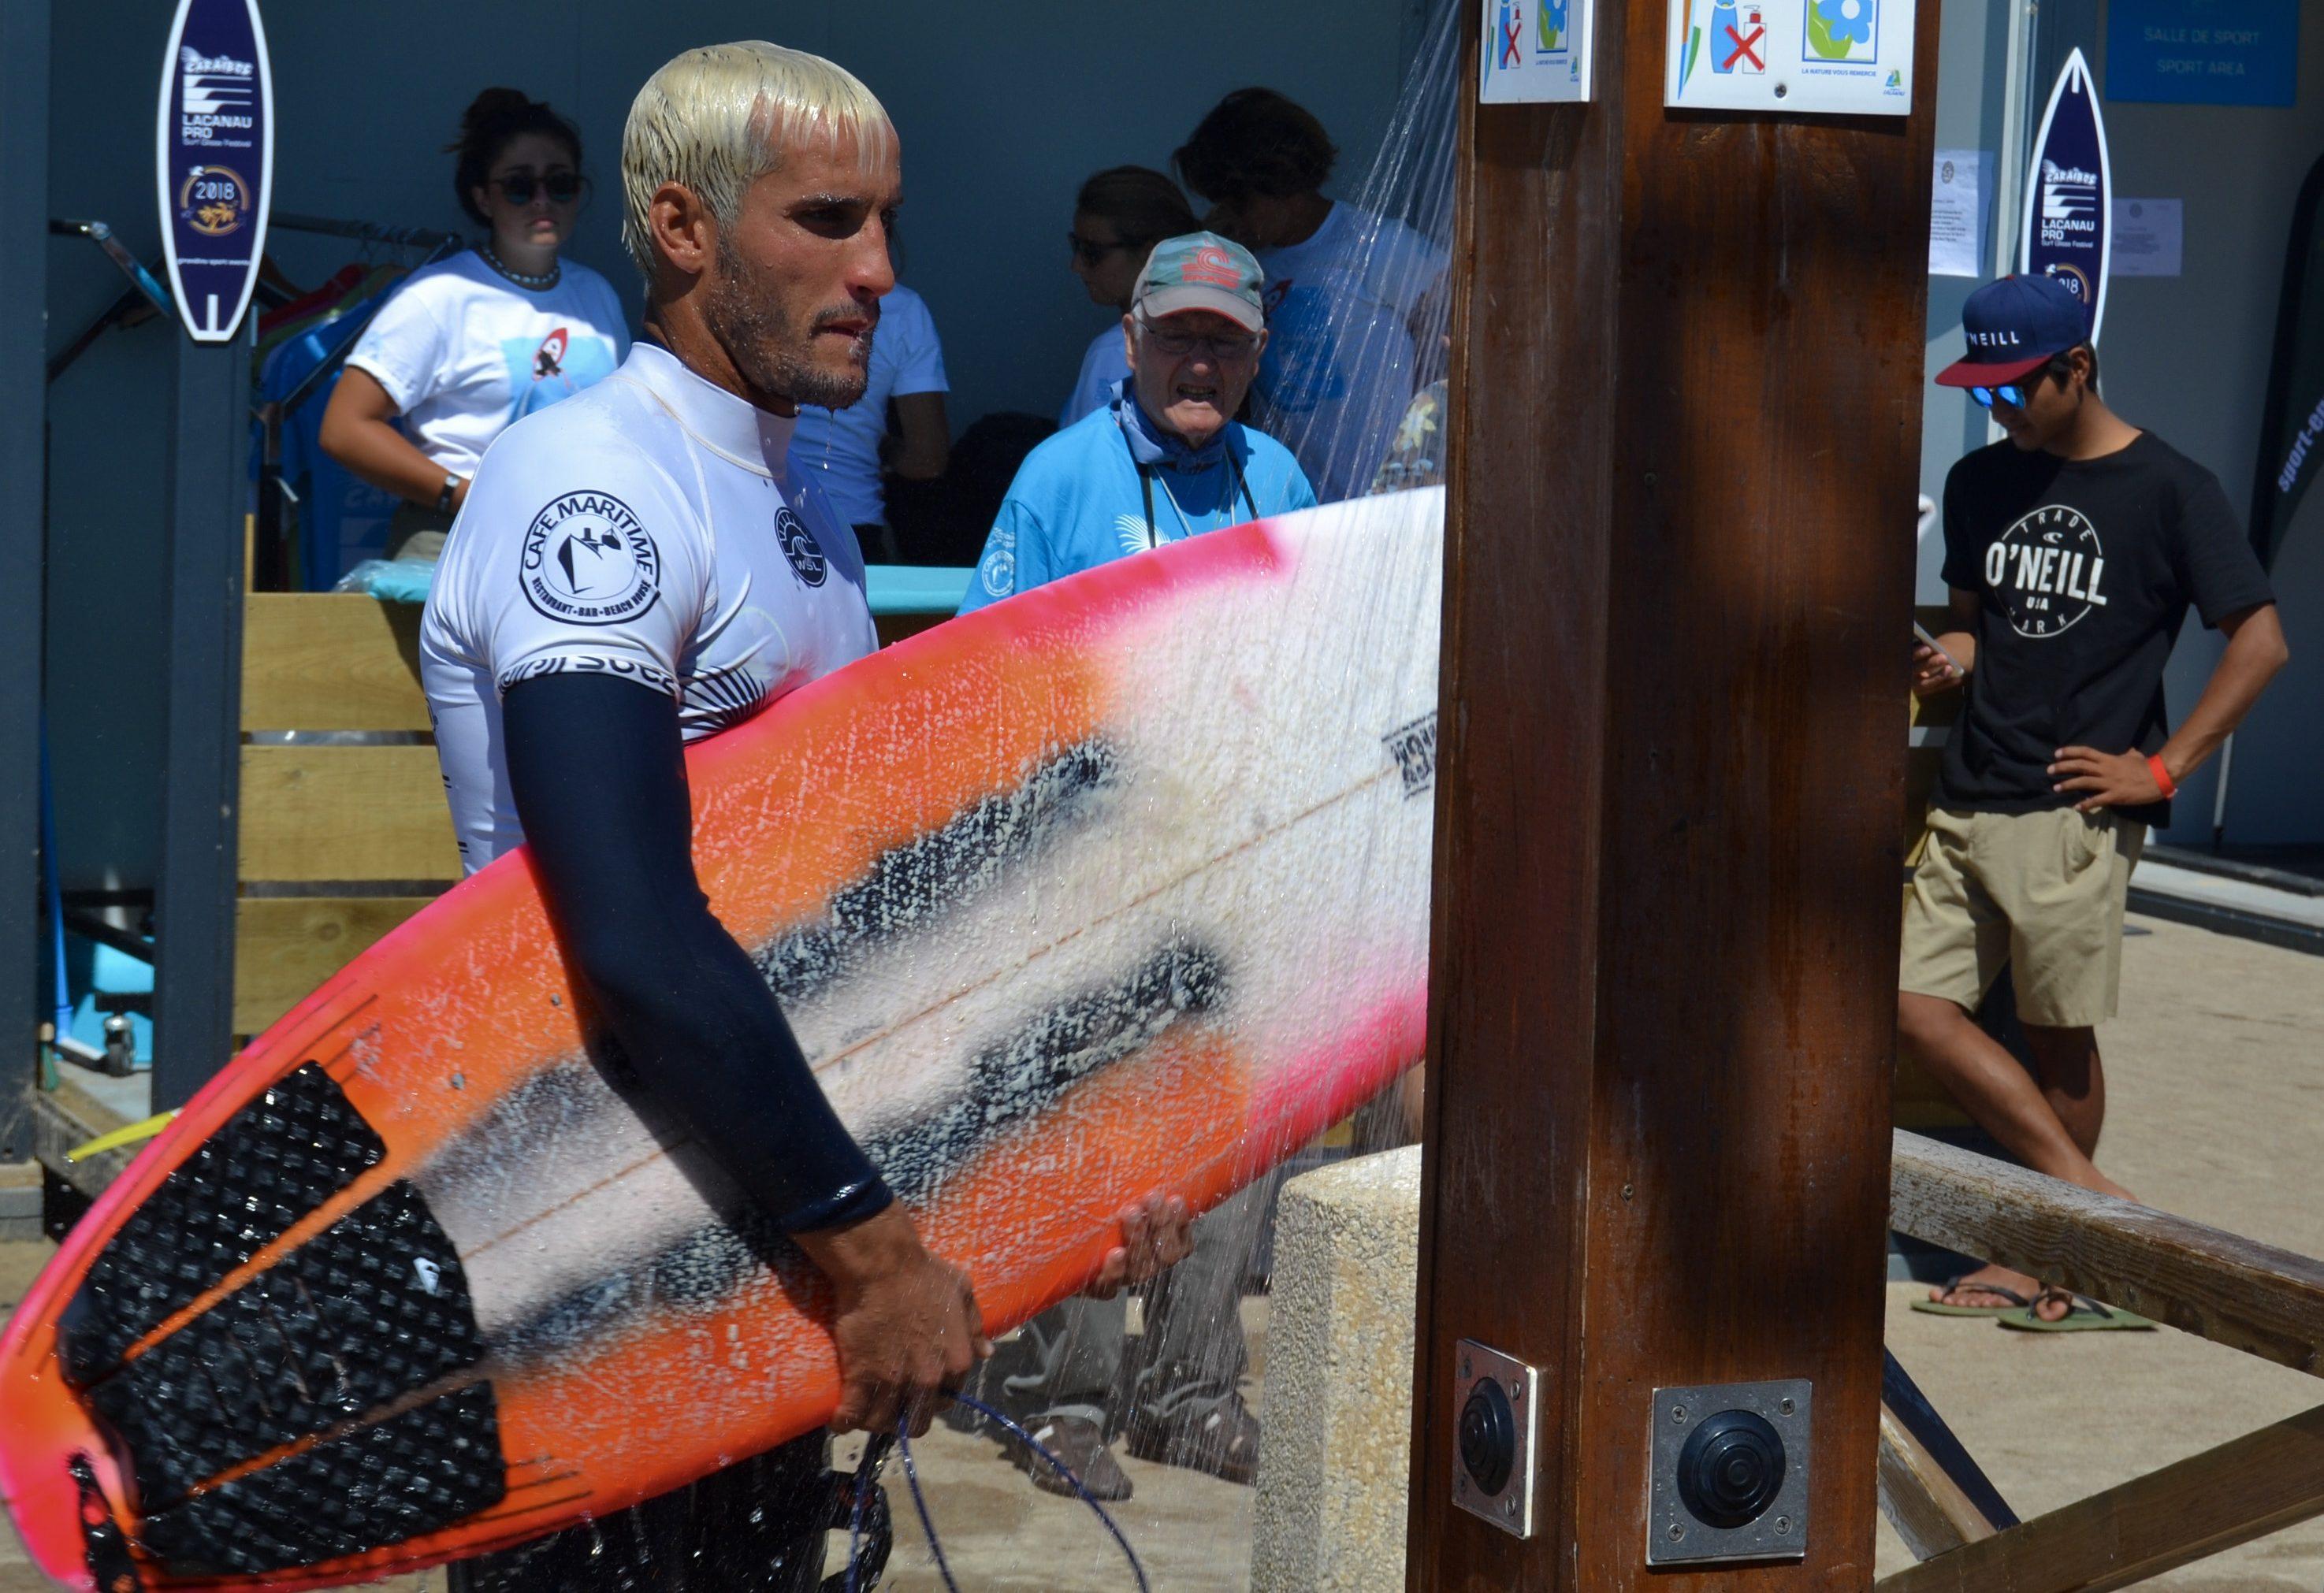 caraibos-lacanau-pro-surf-blog-voyage-les-ptits-touristes-wsl-ramzi-boukhiam (2)